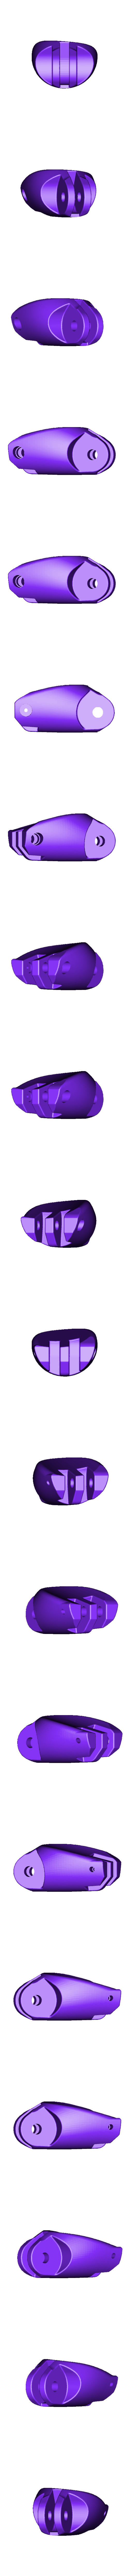 pouce_-_m%C3%A9tacarpe_1.stl Download free STL file Articulated hand • 3D printer model, NOP21